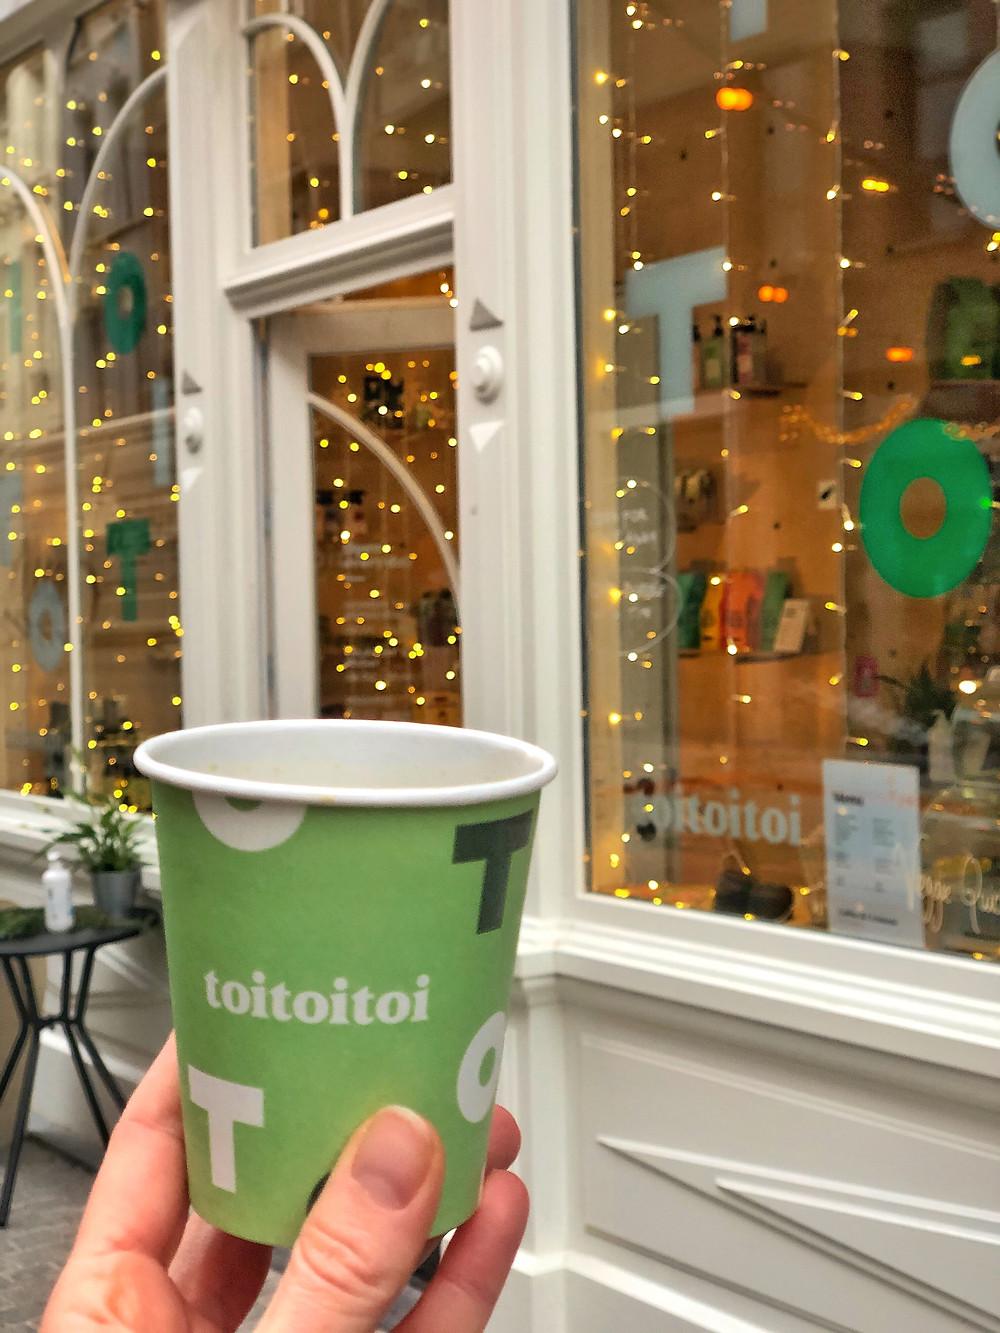 ToiToiToi - Specialty Coffee x Culture Antwerp, take away coffee